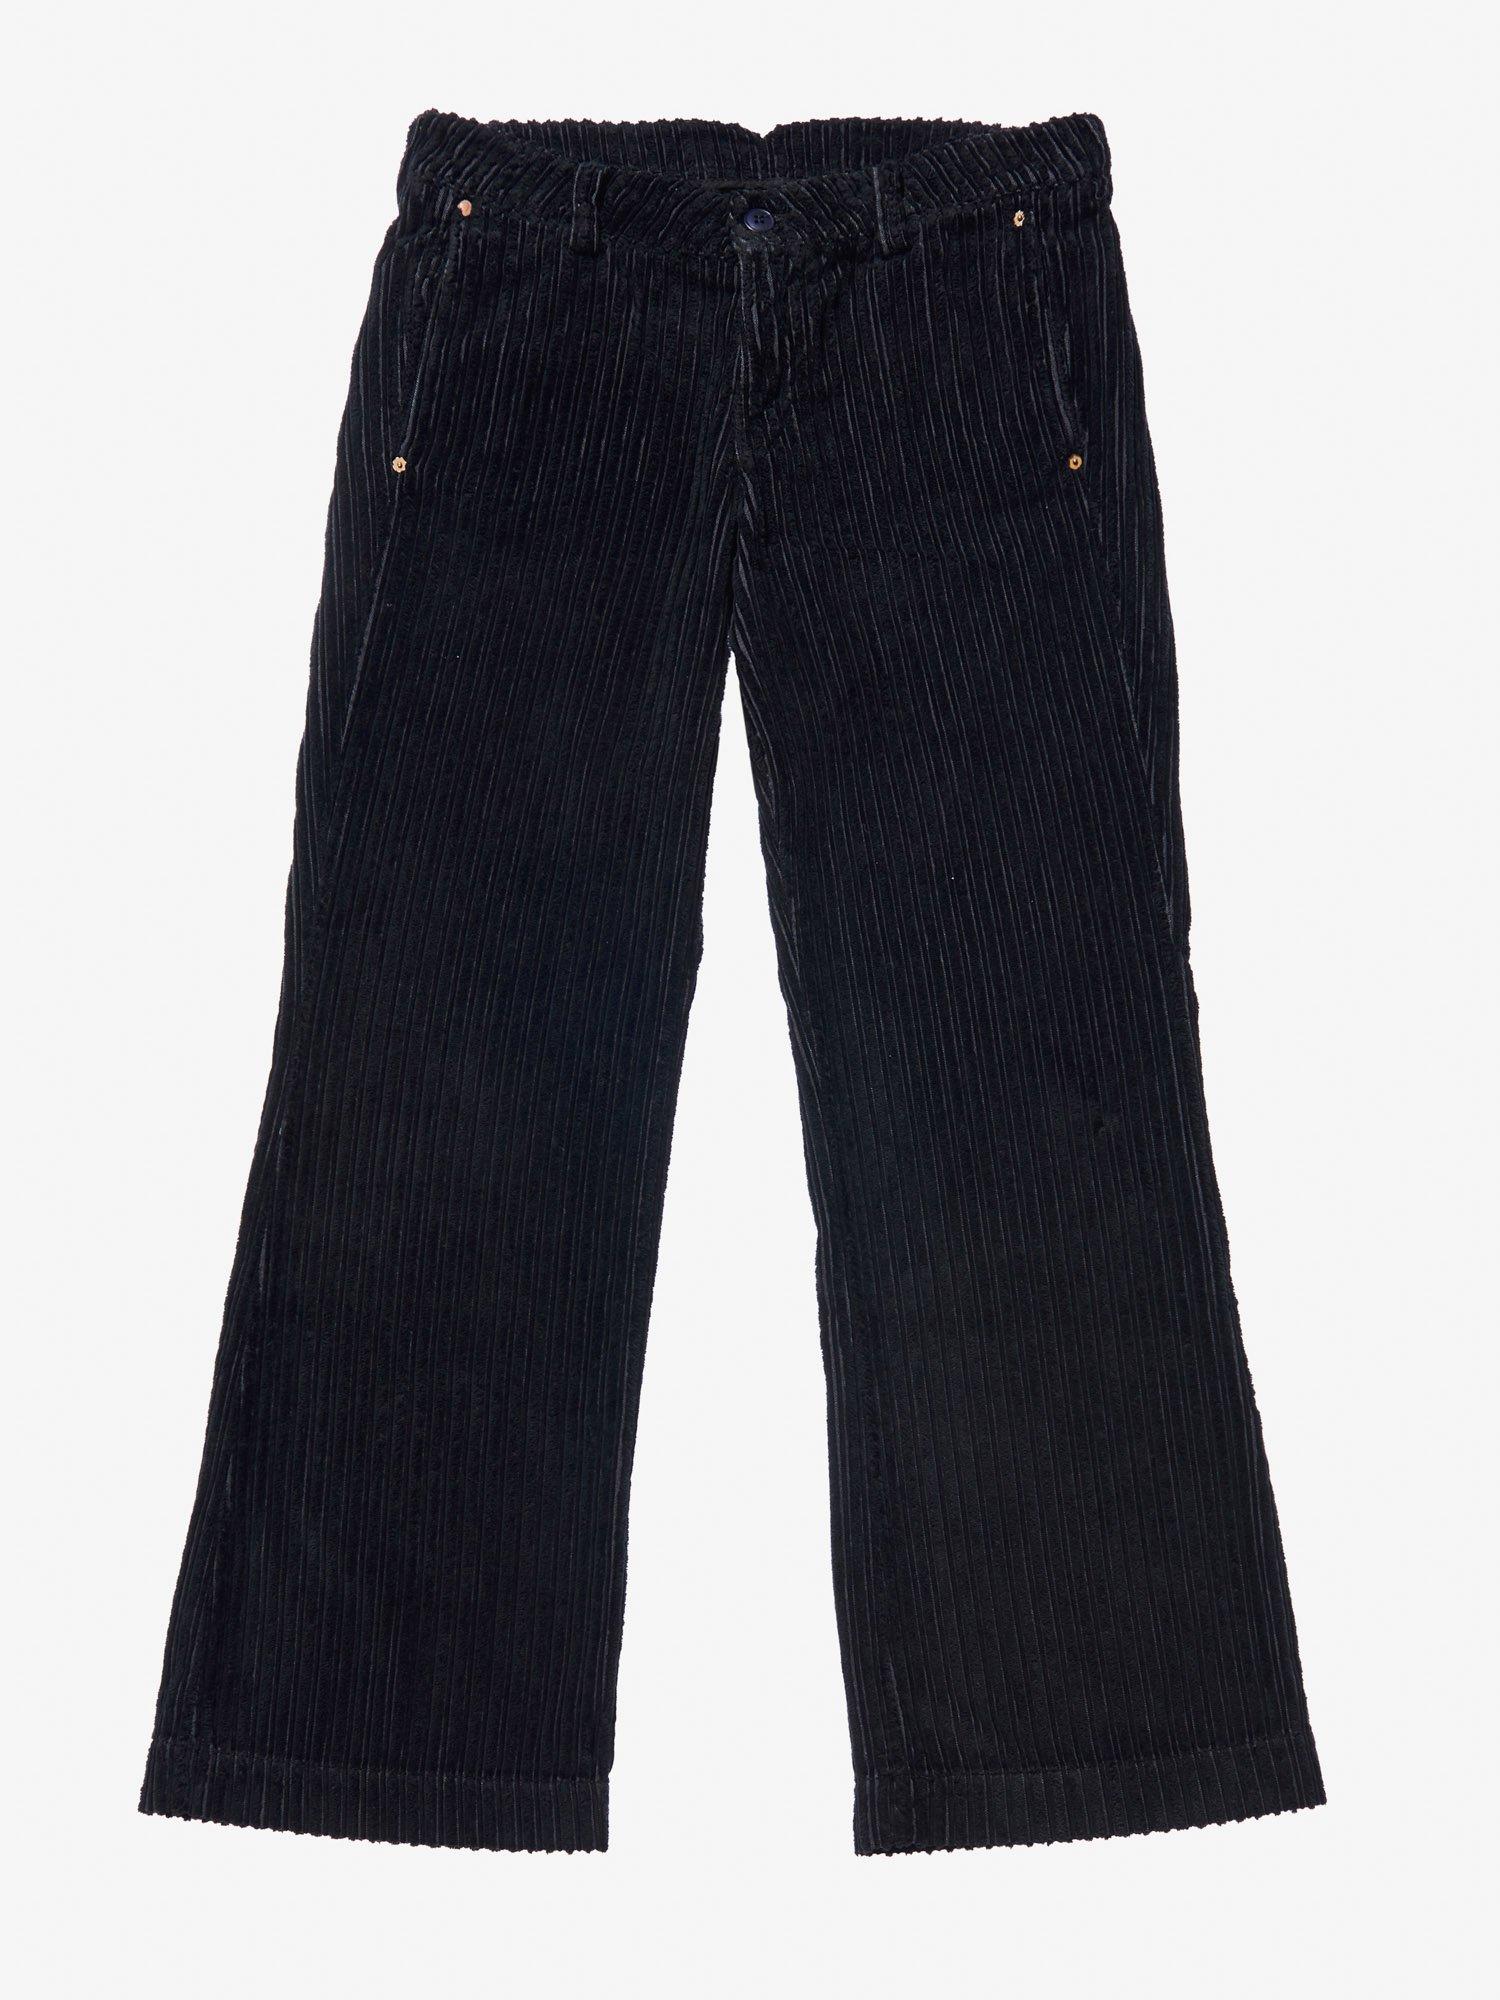 FINE WALE CORDUROY PANTS - Blauer